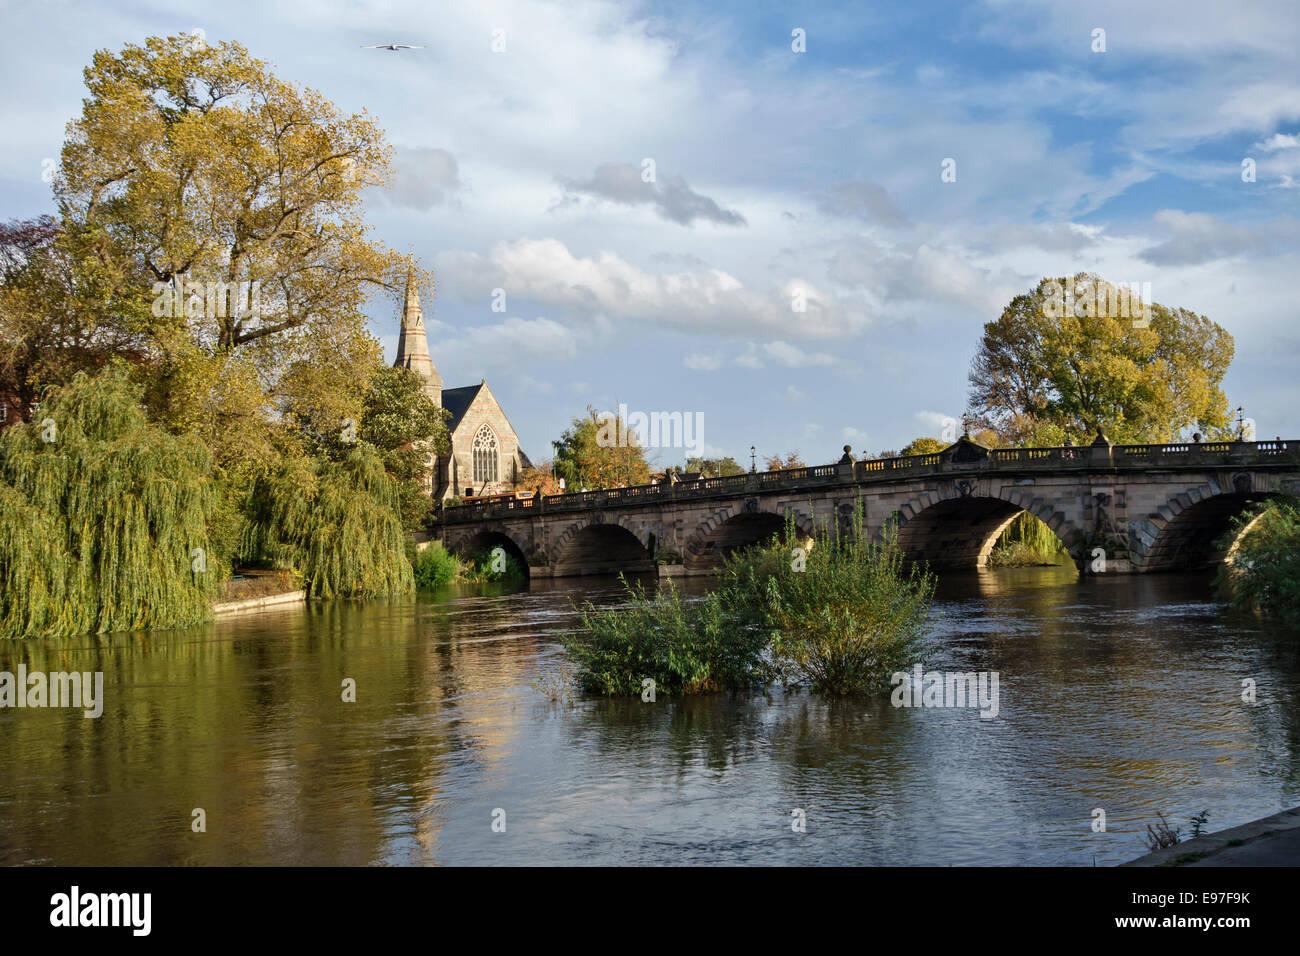 English Bridge over the River Severn, Shrewsbury, Shropshire, UK. The United Reformed Church (URC) is on the left - Stock Image